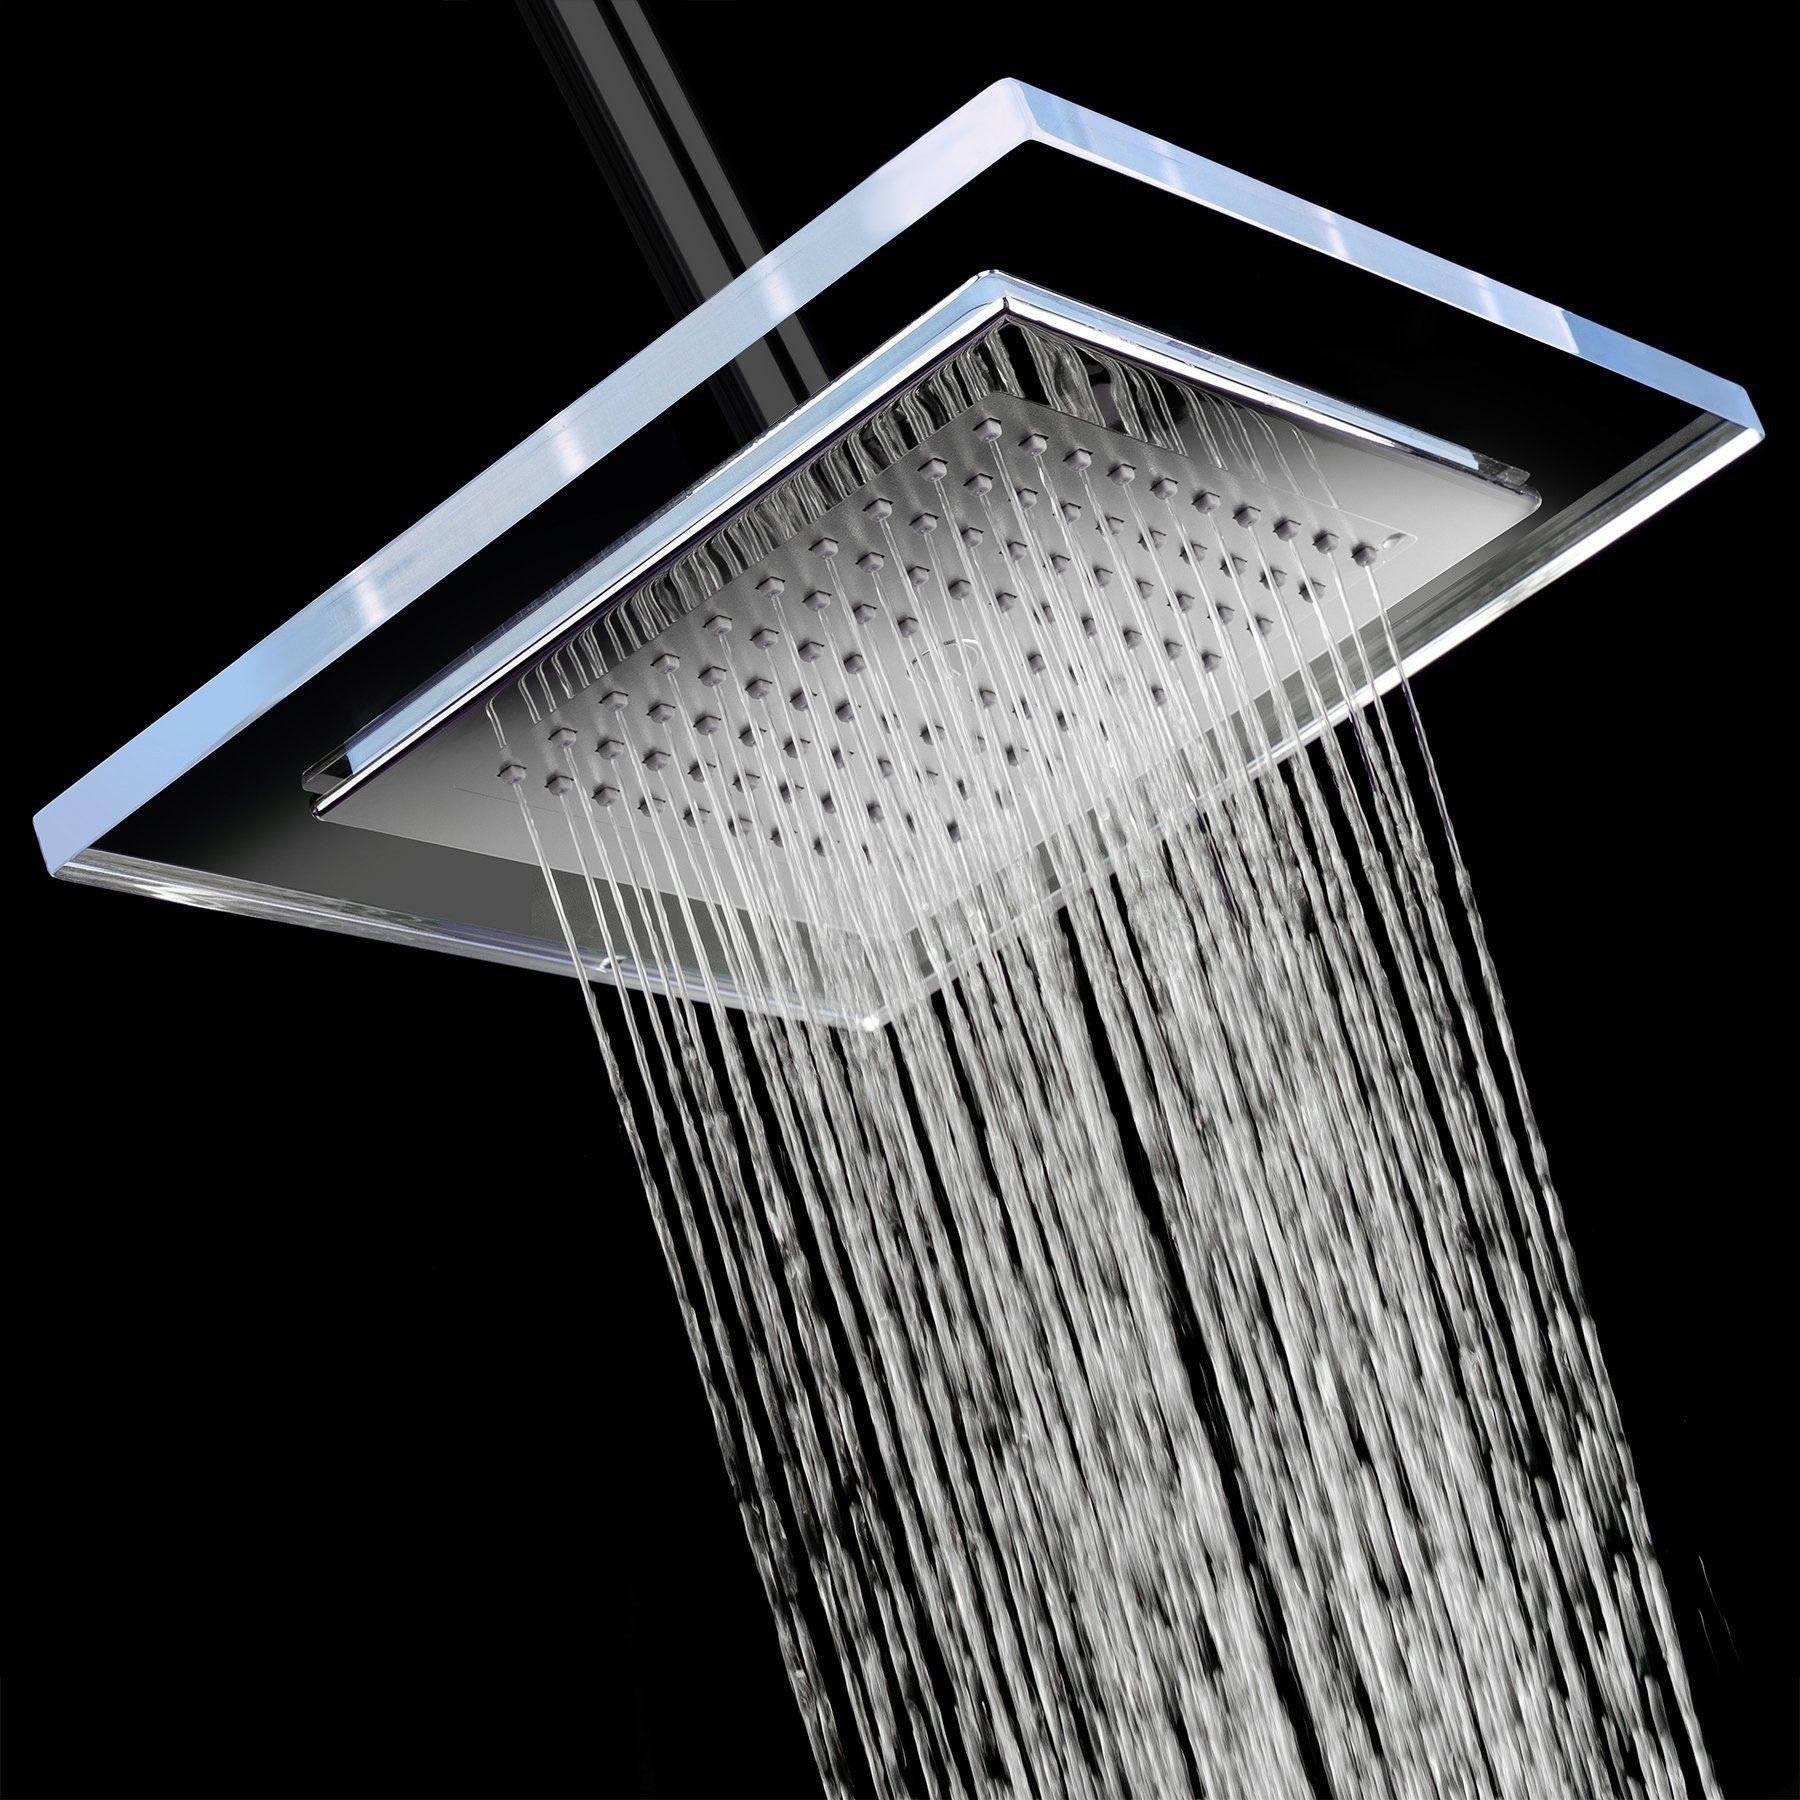 Akdy Sh0079 9 Rainfall Shower Style Head Contemporary Modern Home